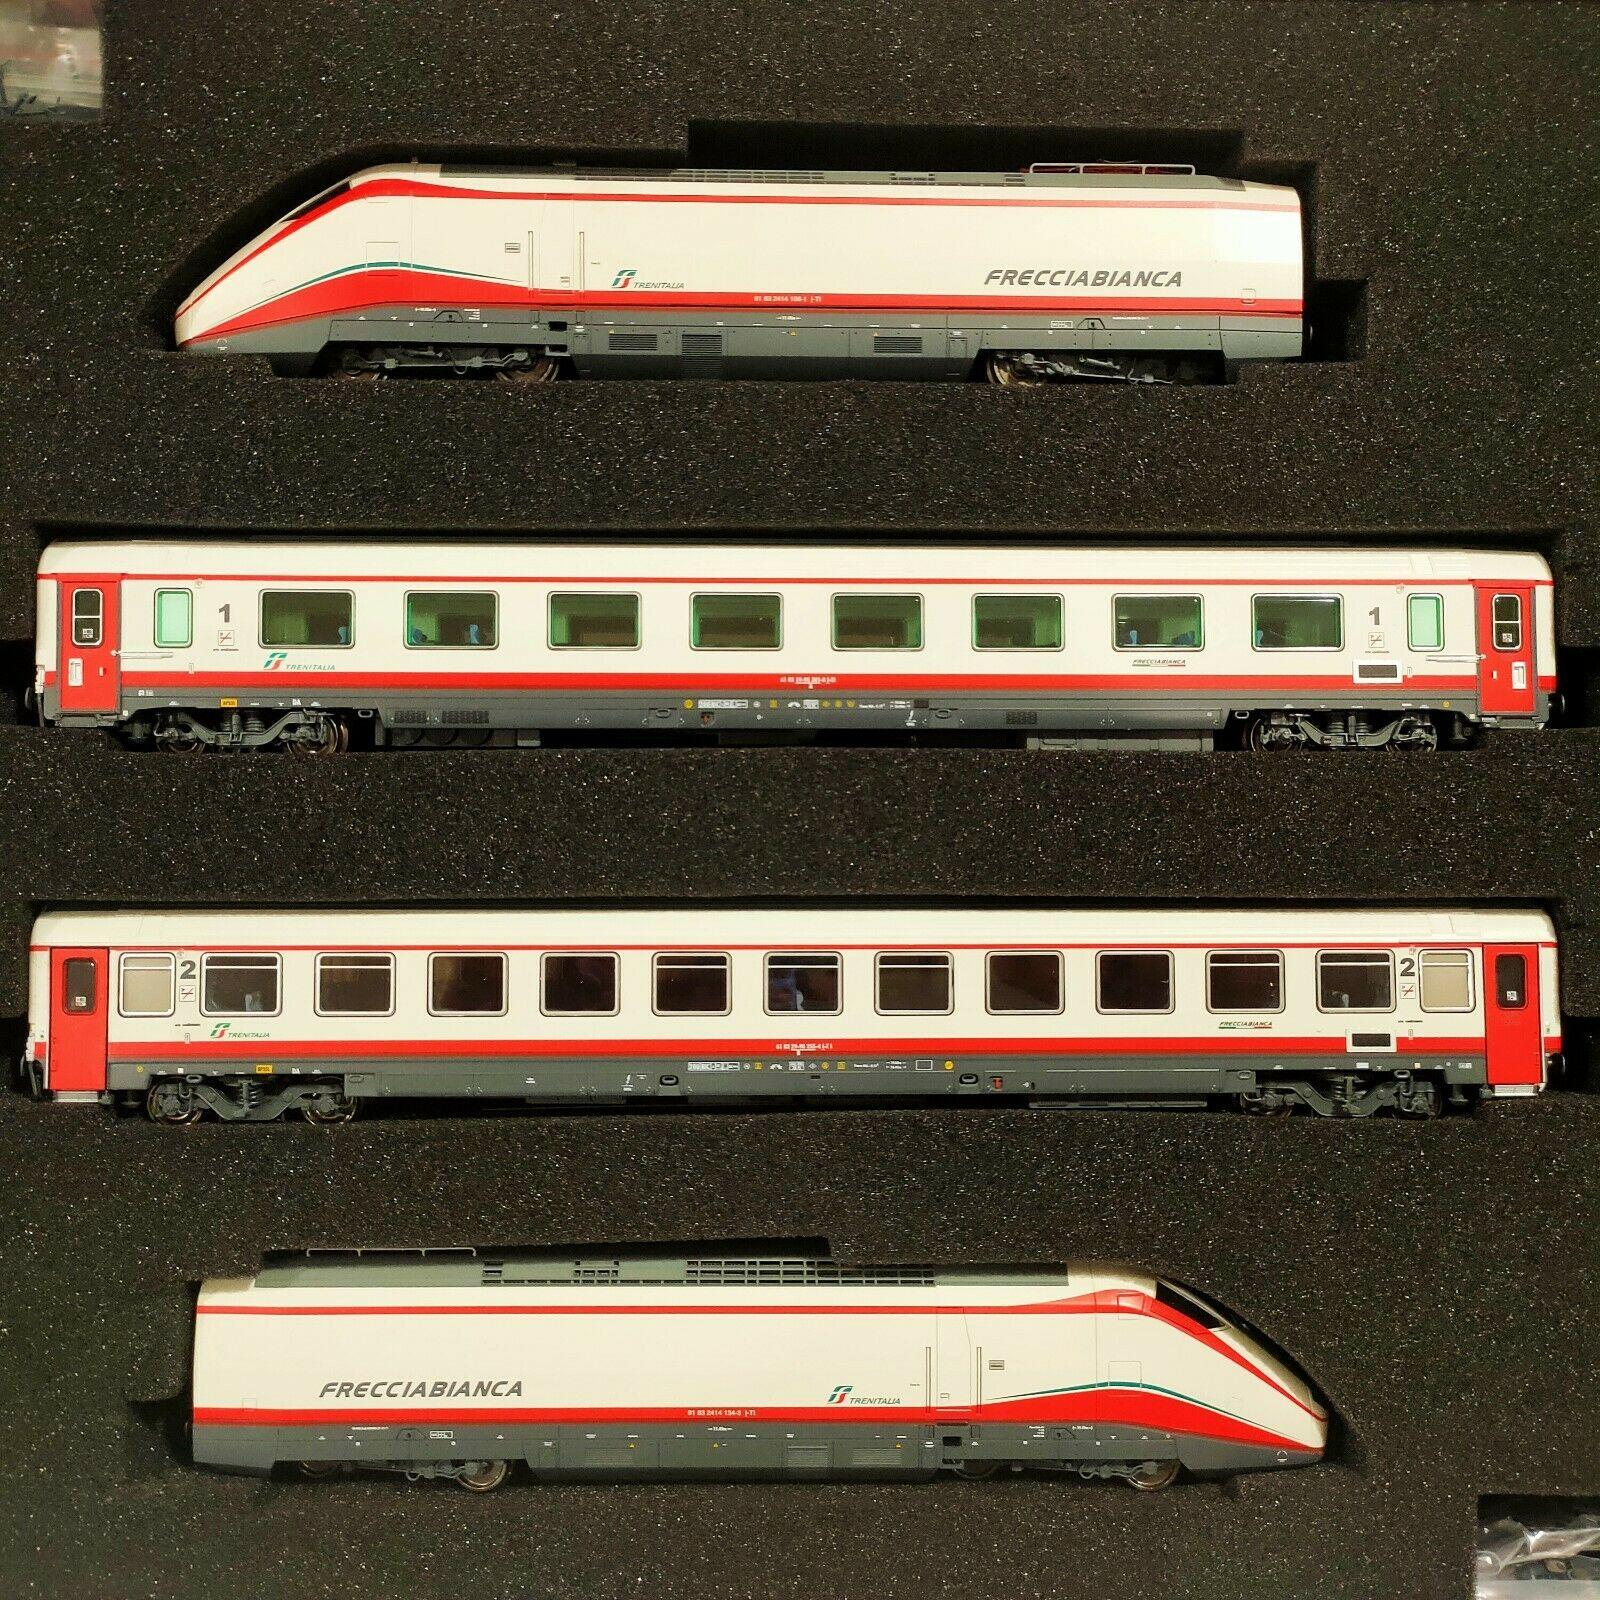 1/87 Treno Frecciabianca composto - da due motrici e duecarrozze